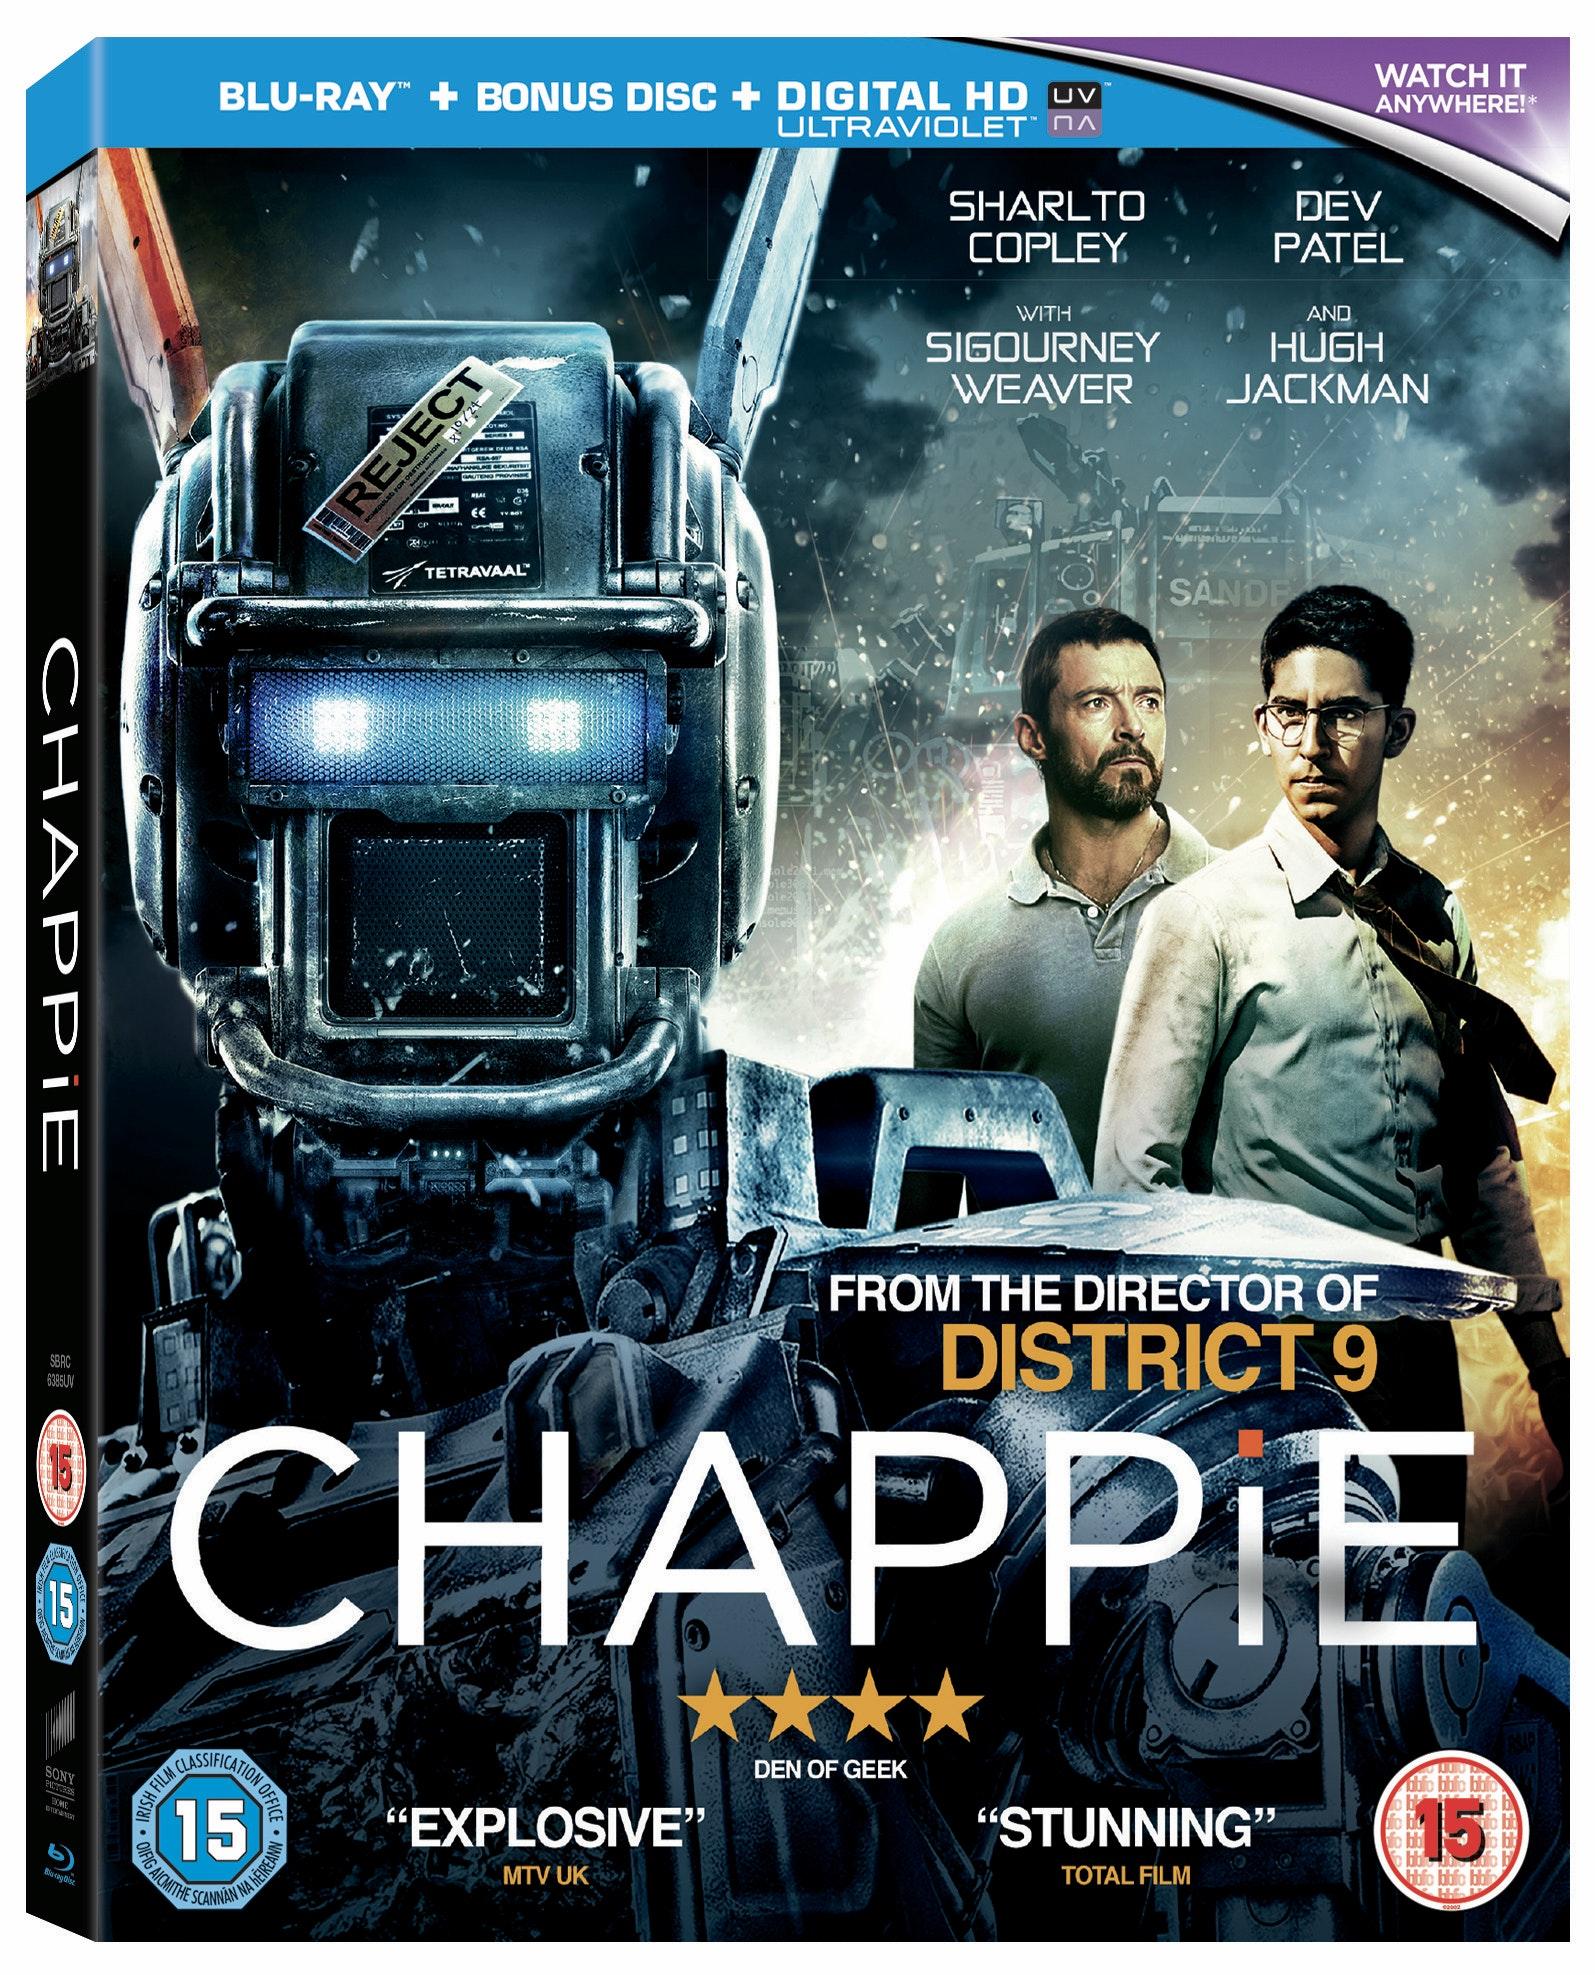 Chappie blu-ray sweepstakes